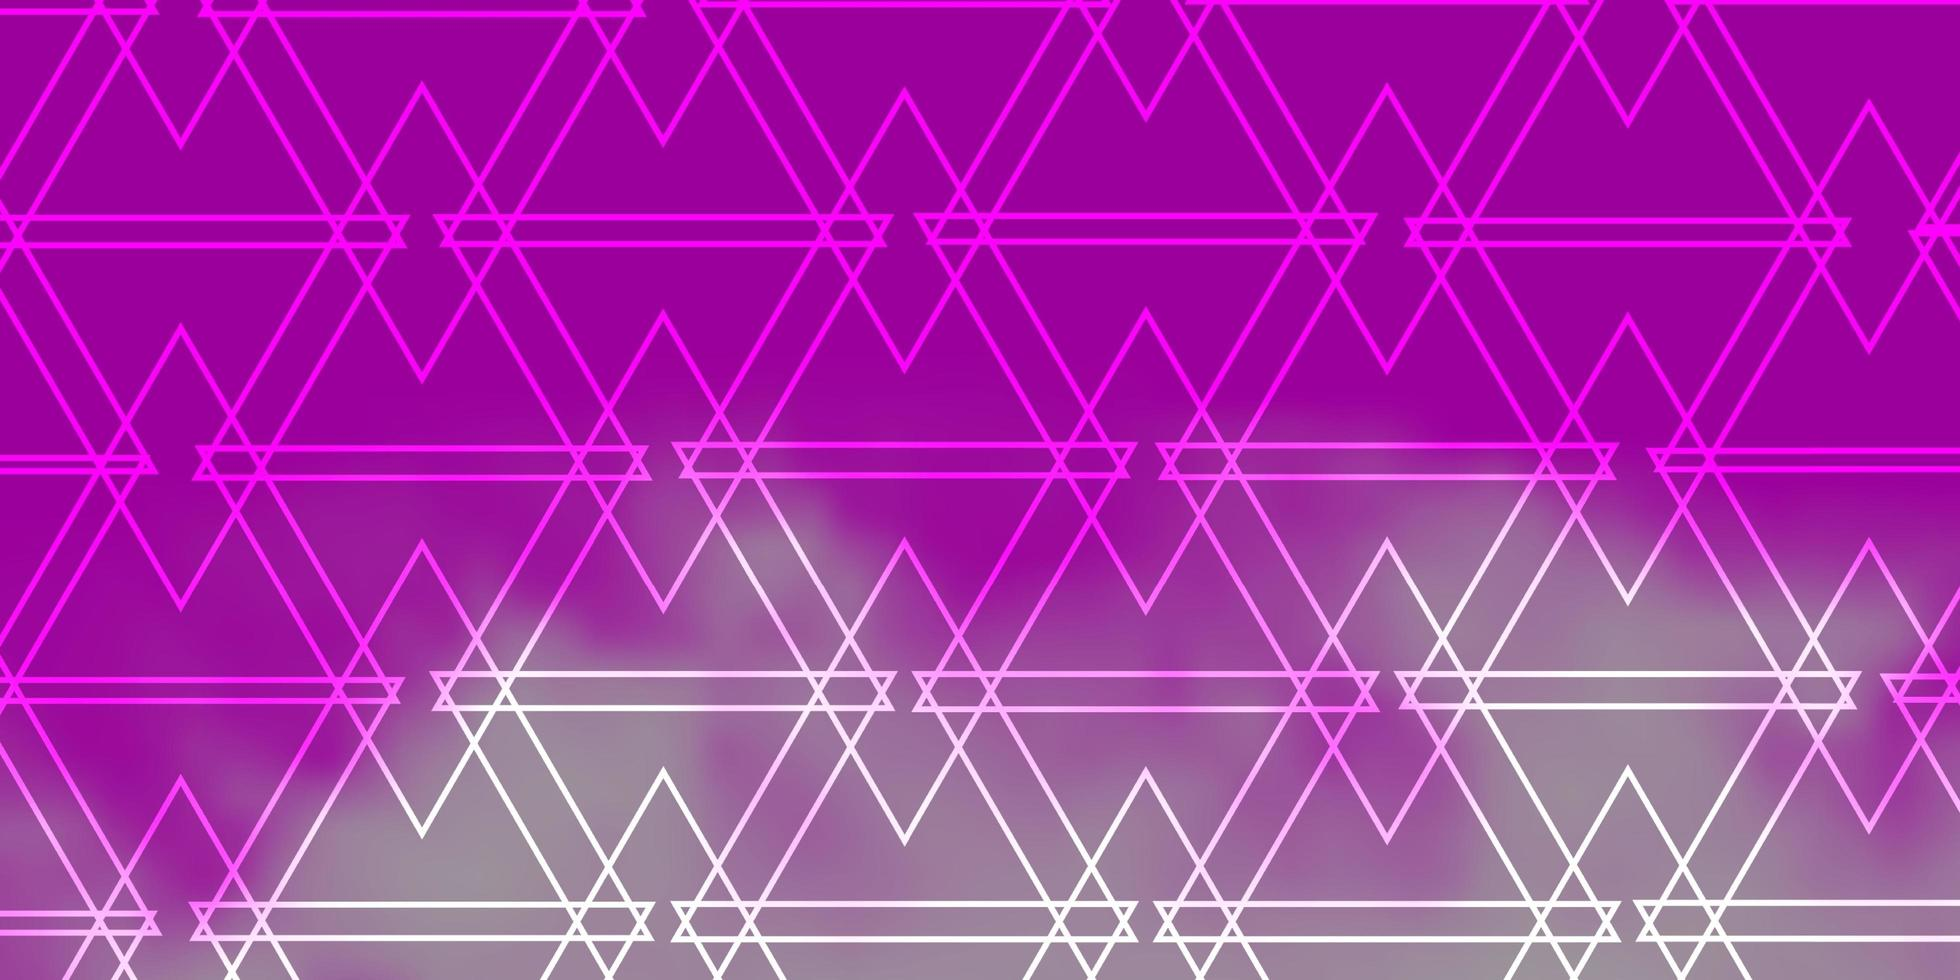 rosa Muster mit polygonalem Stil. vektor